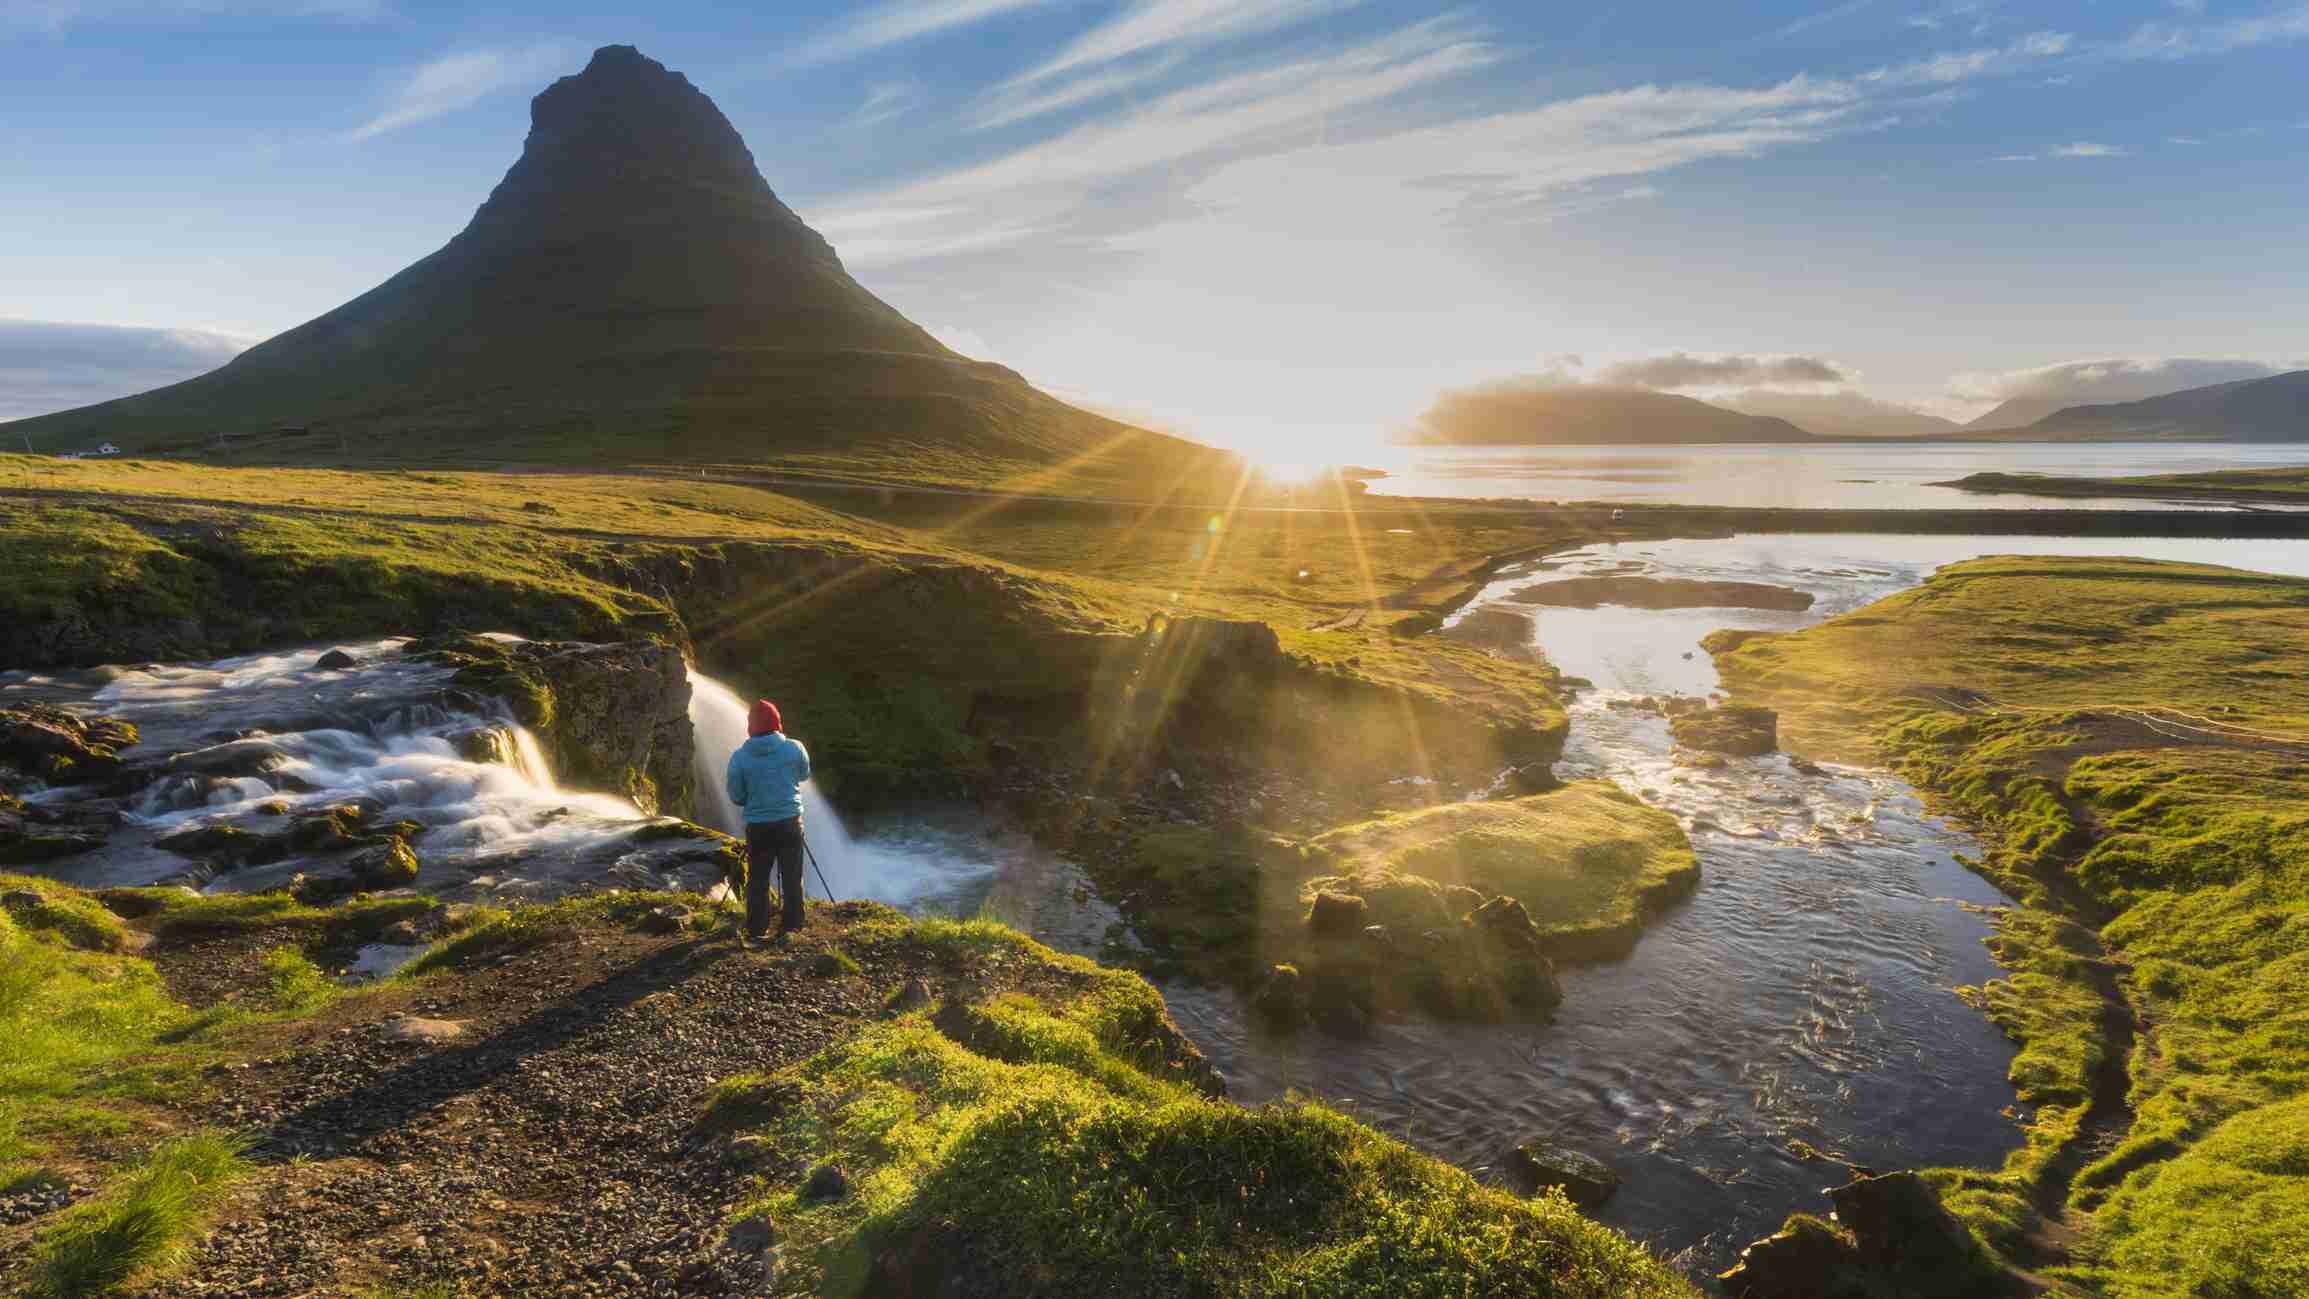 Kirkjufell in Snaefellsnes Penisula, Iceland